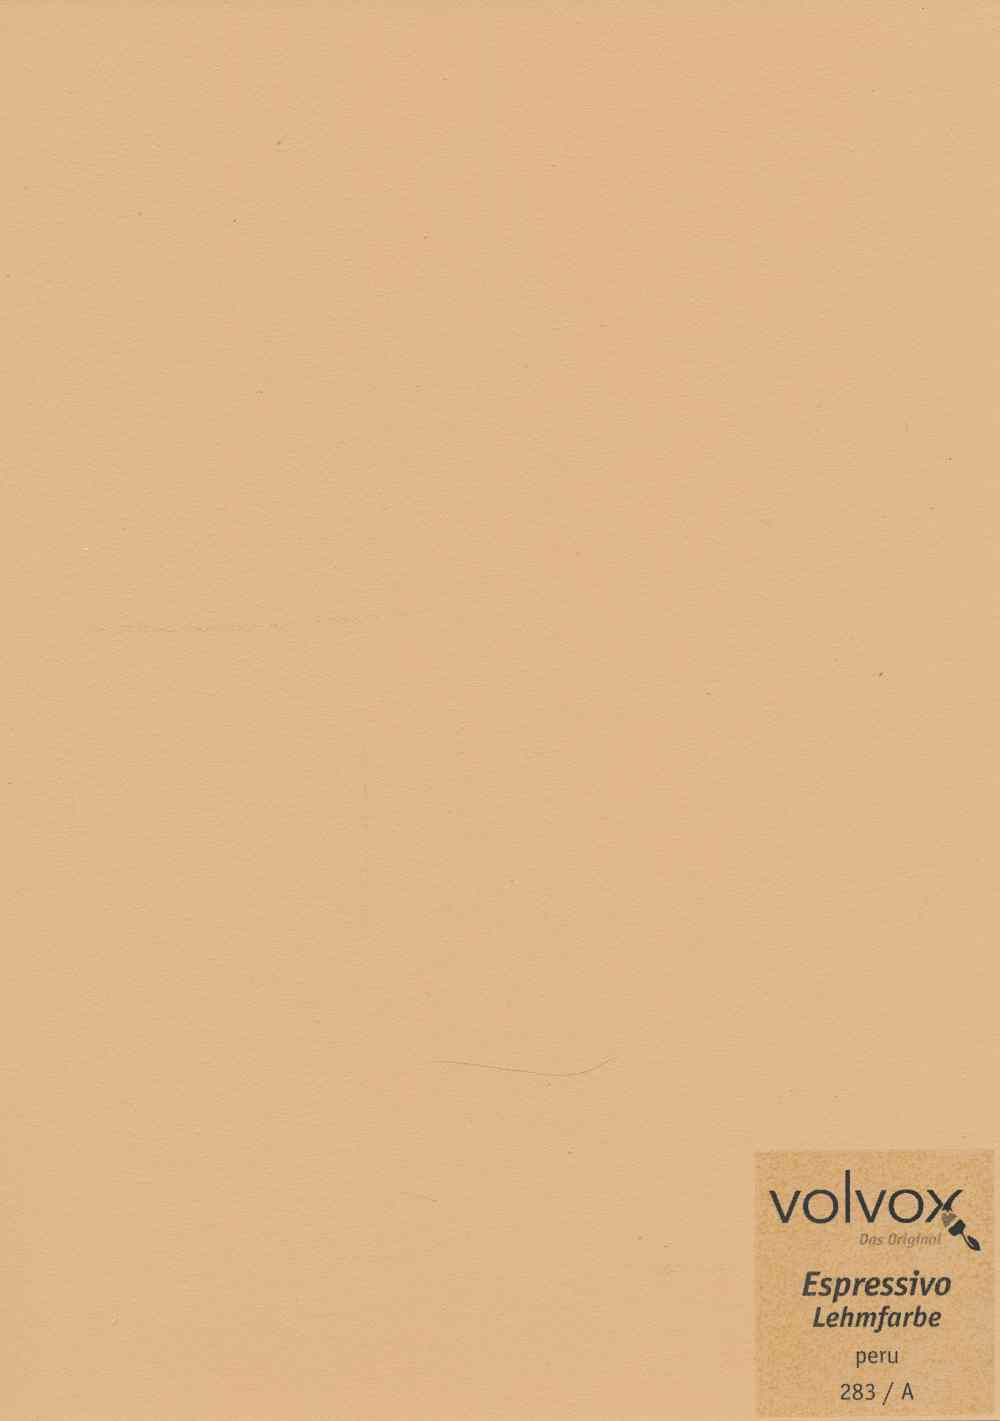 Volvox Espressivo Lehmfarbe 283 peru